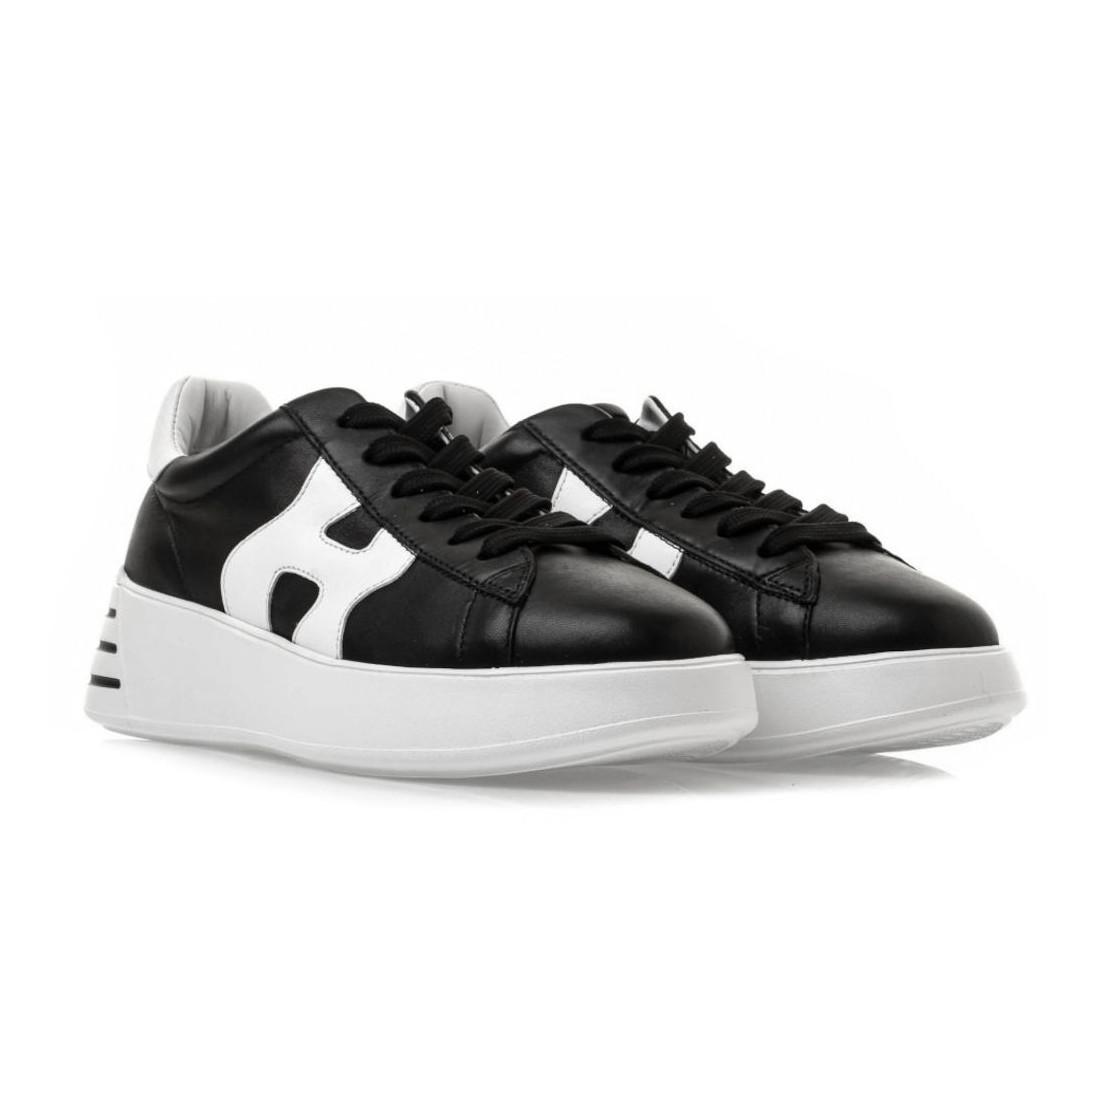 sneakers damen hogan hxw5640dn60ncr9999 8076